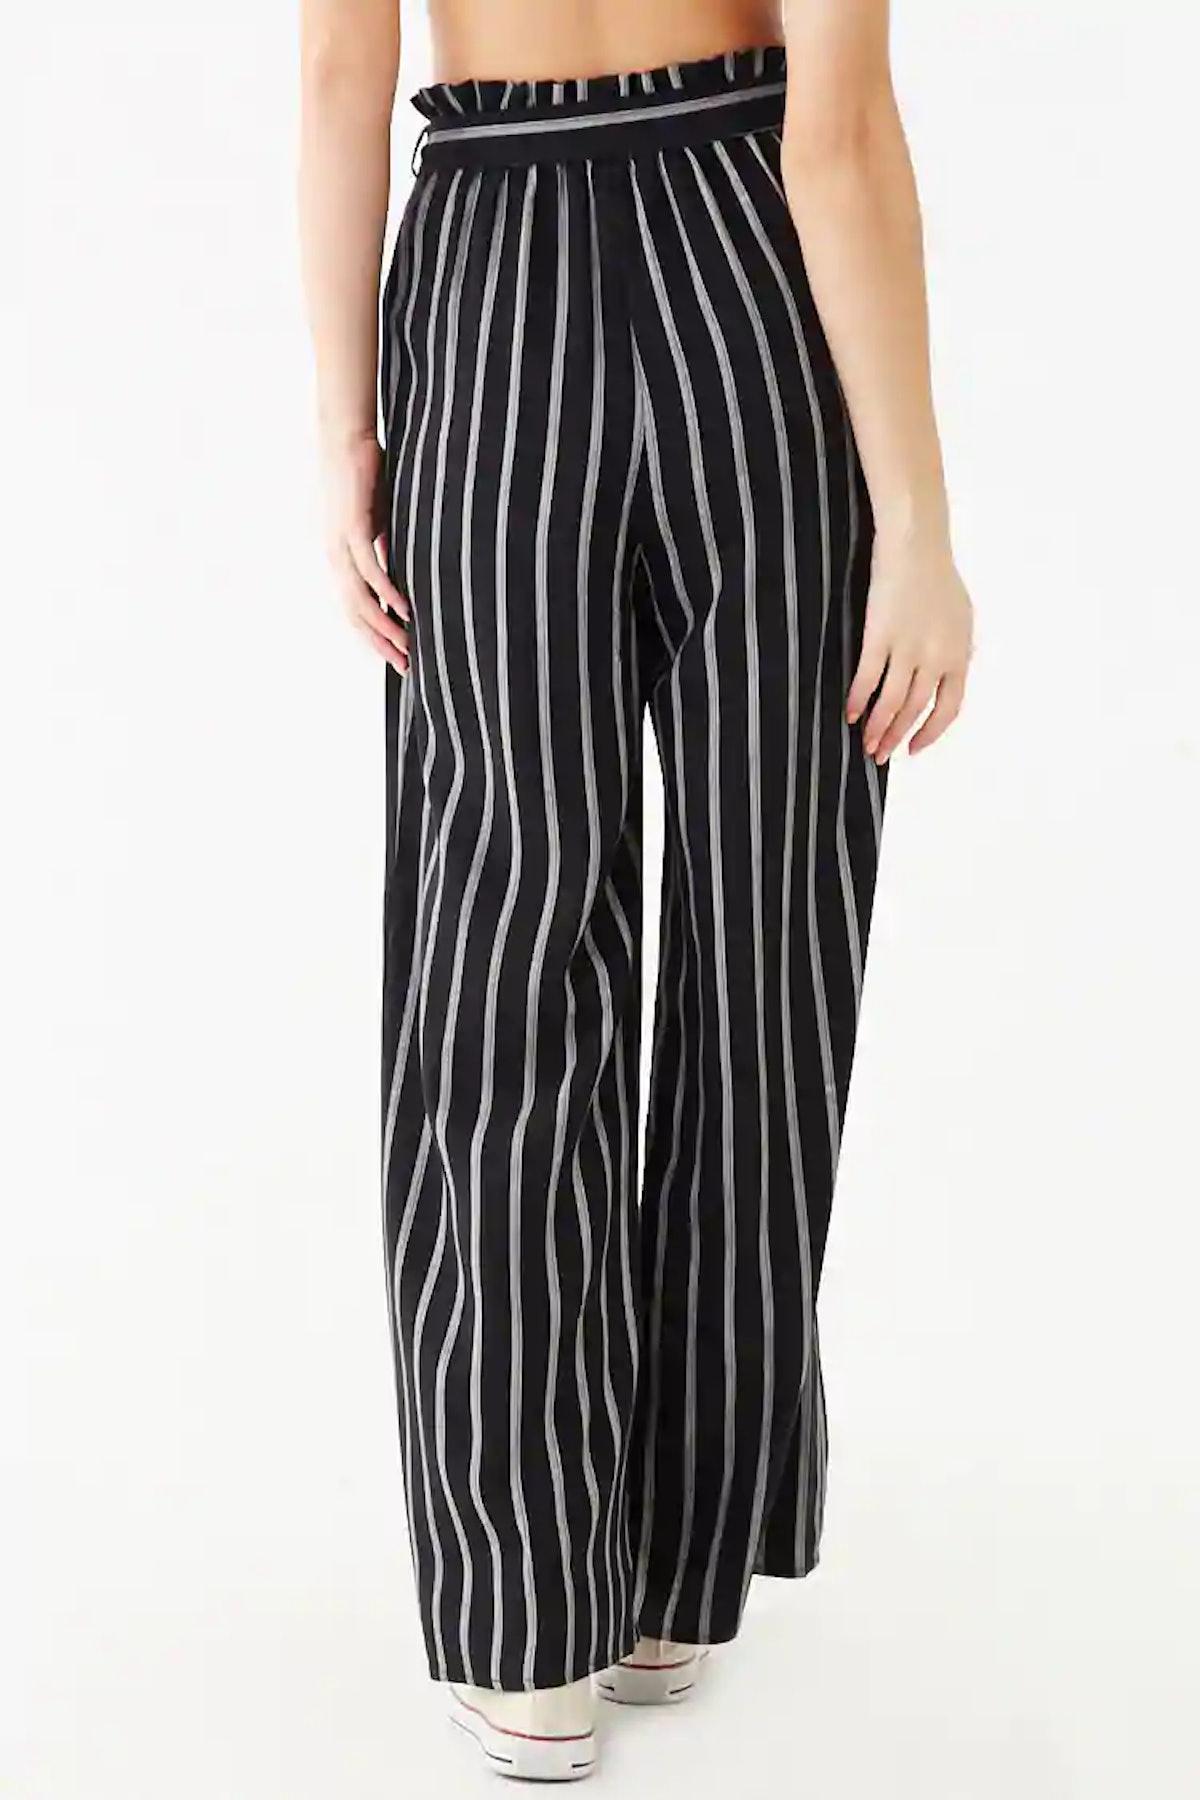 Striped Paperbag Pants